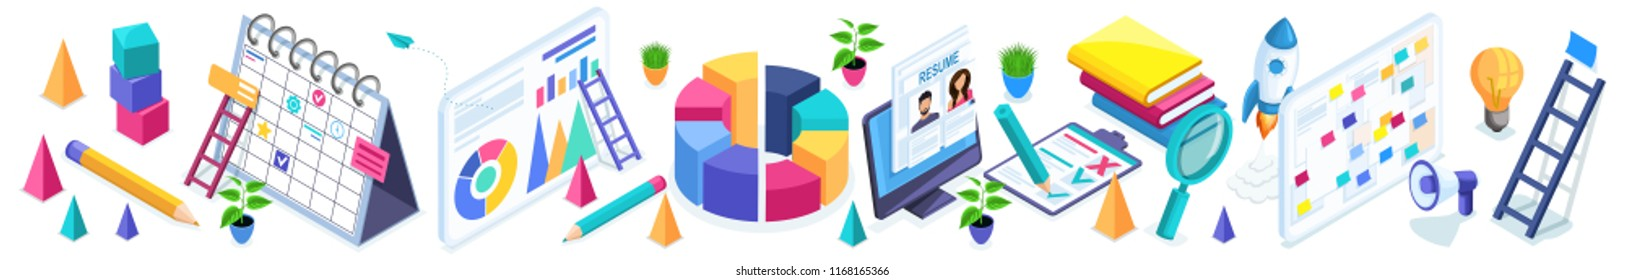 Isometrics set of business icons, diagram, graphs, data, indicators, summary, ladder, computer, calendar on isolated background. Vector illustration